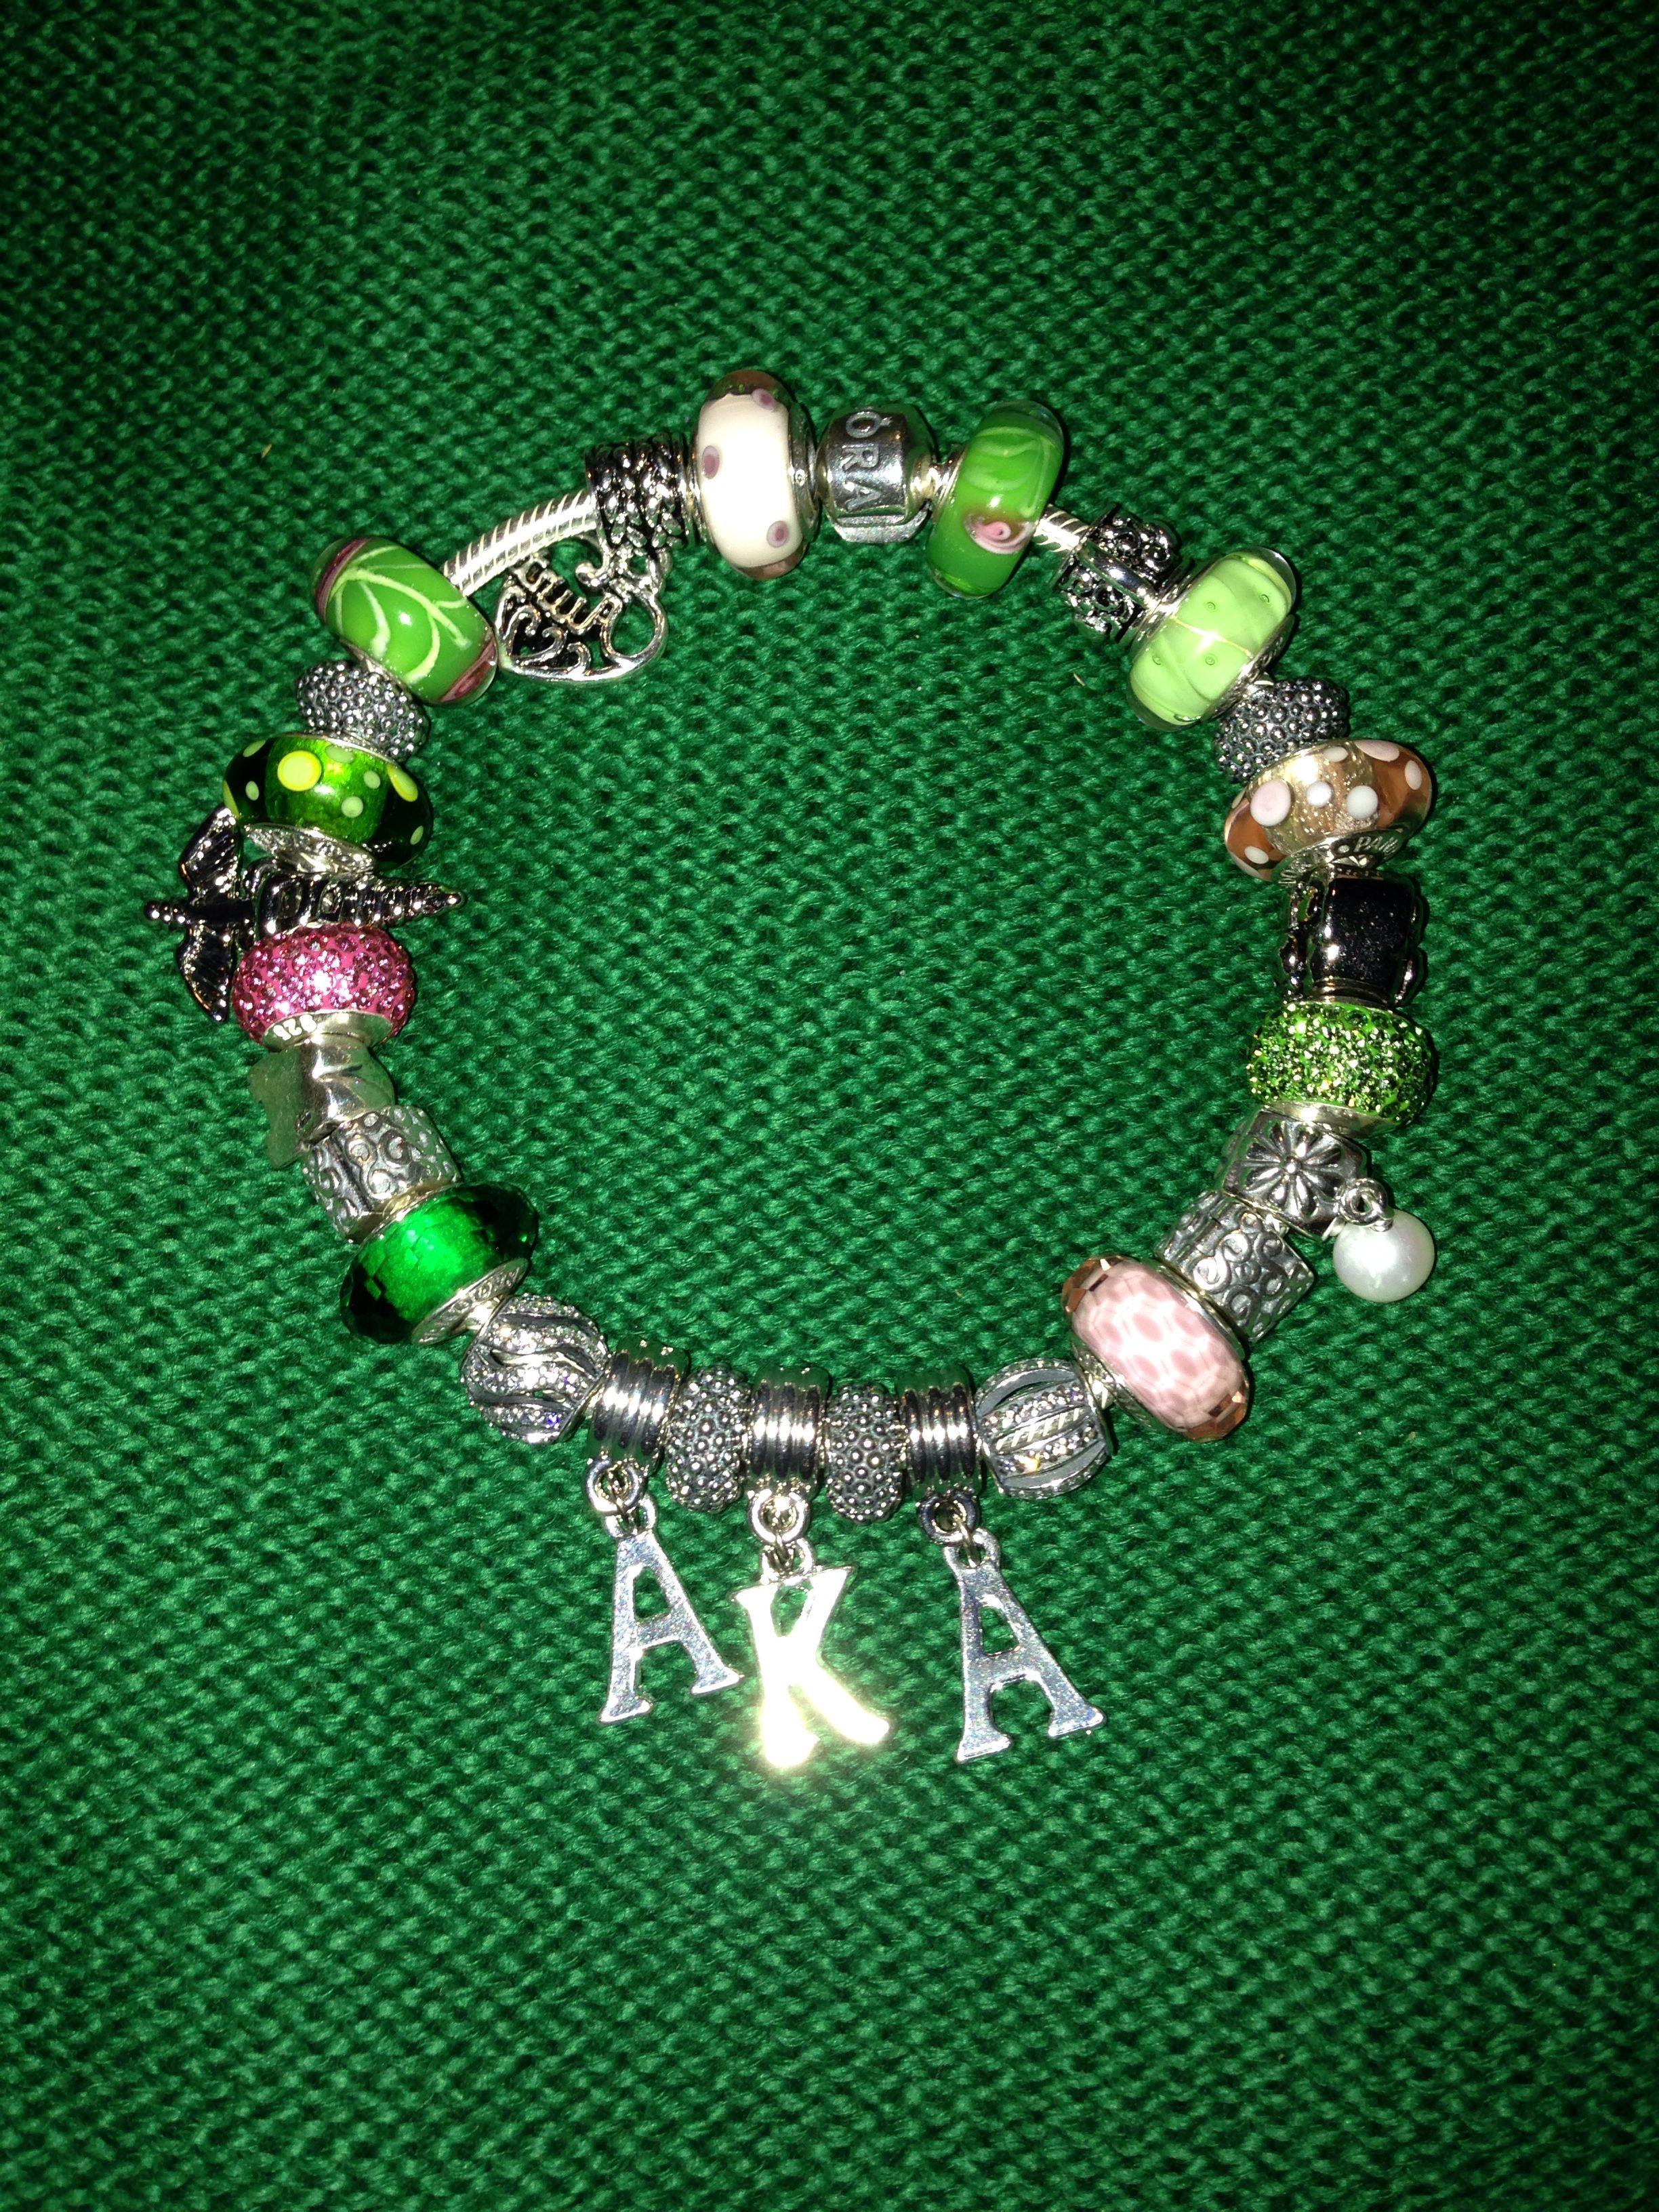 a8b862124 My beautiful AKA Pandora Bracelet | LaChy's AKA | Pandora bracelets ...